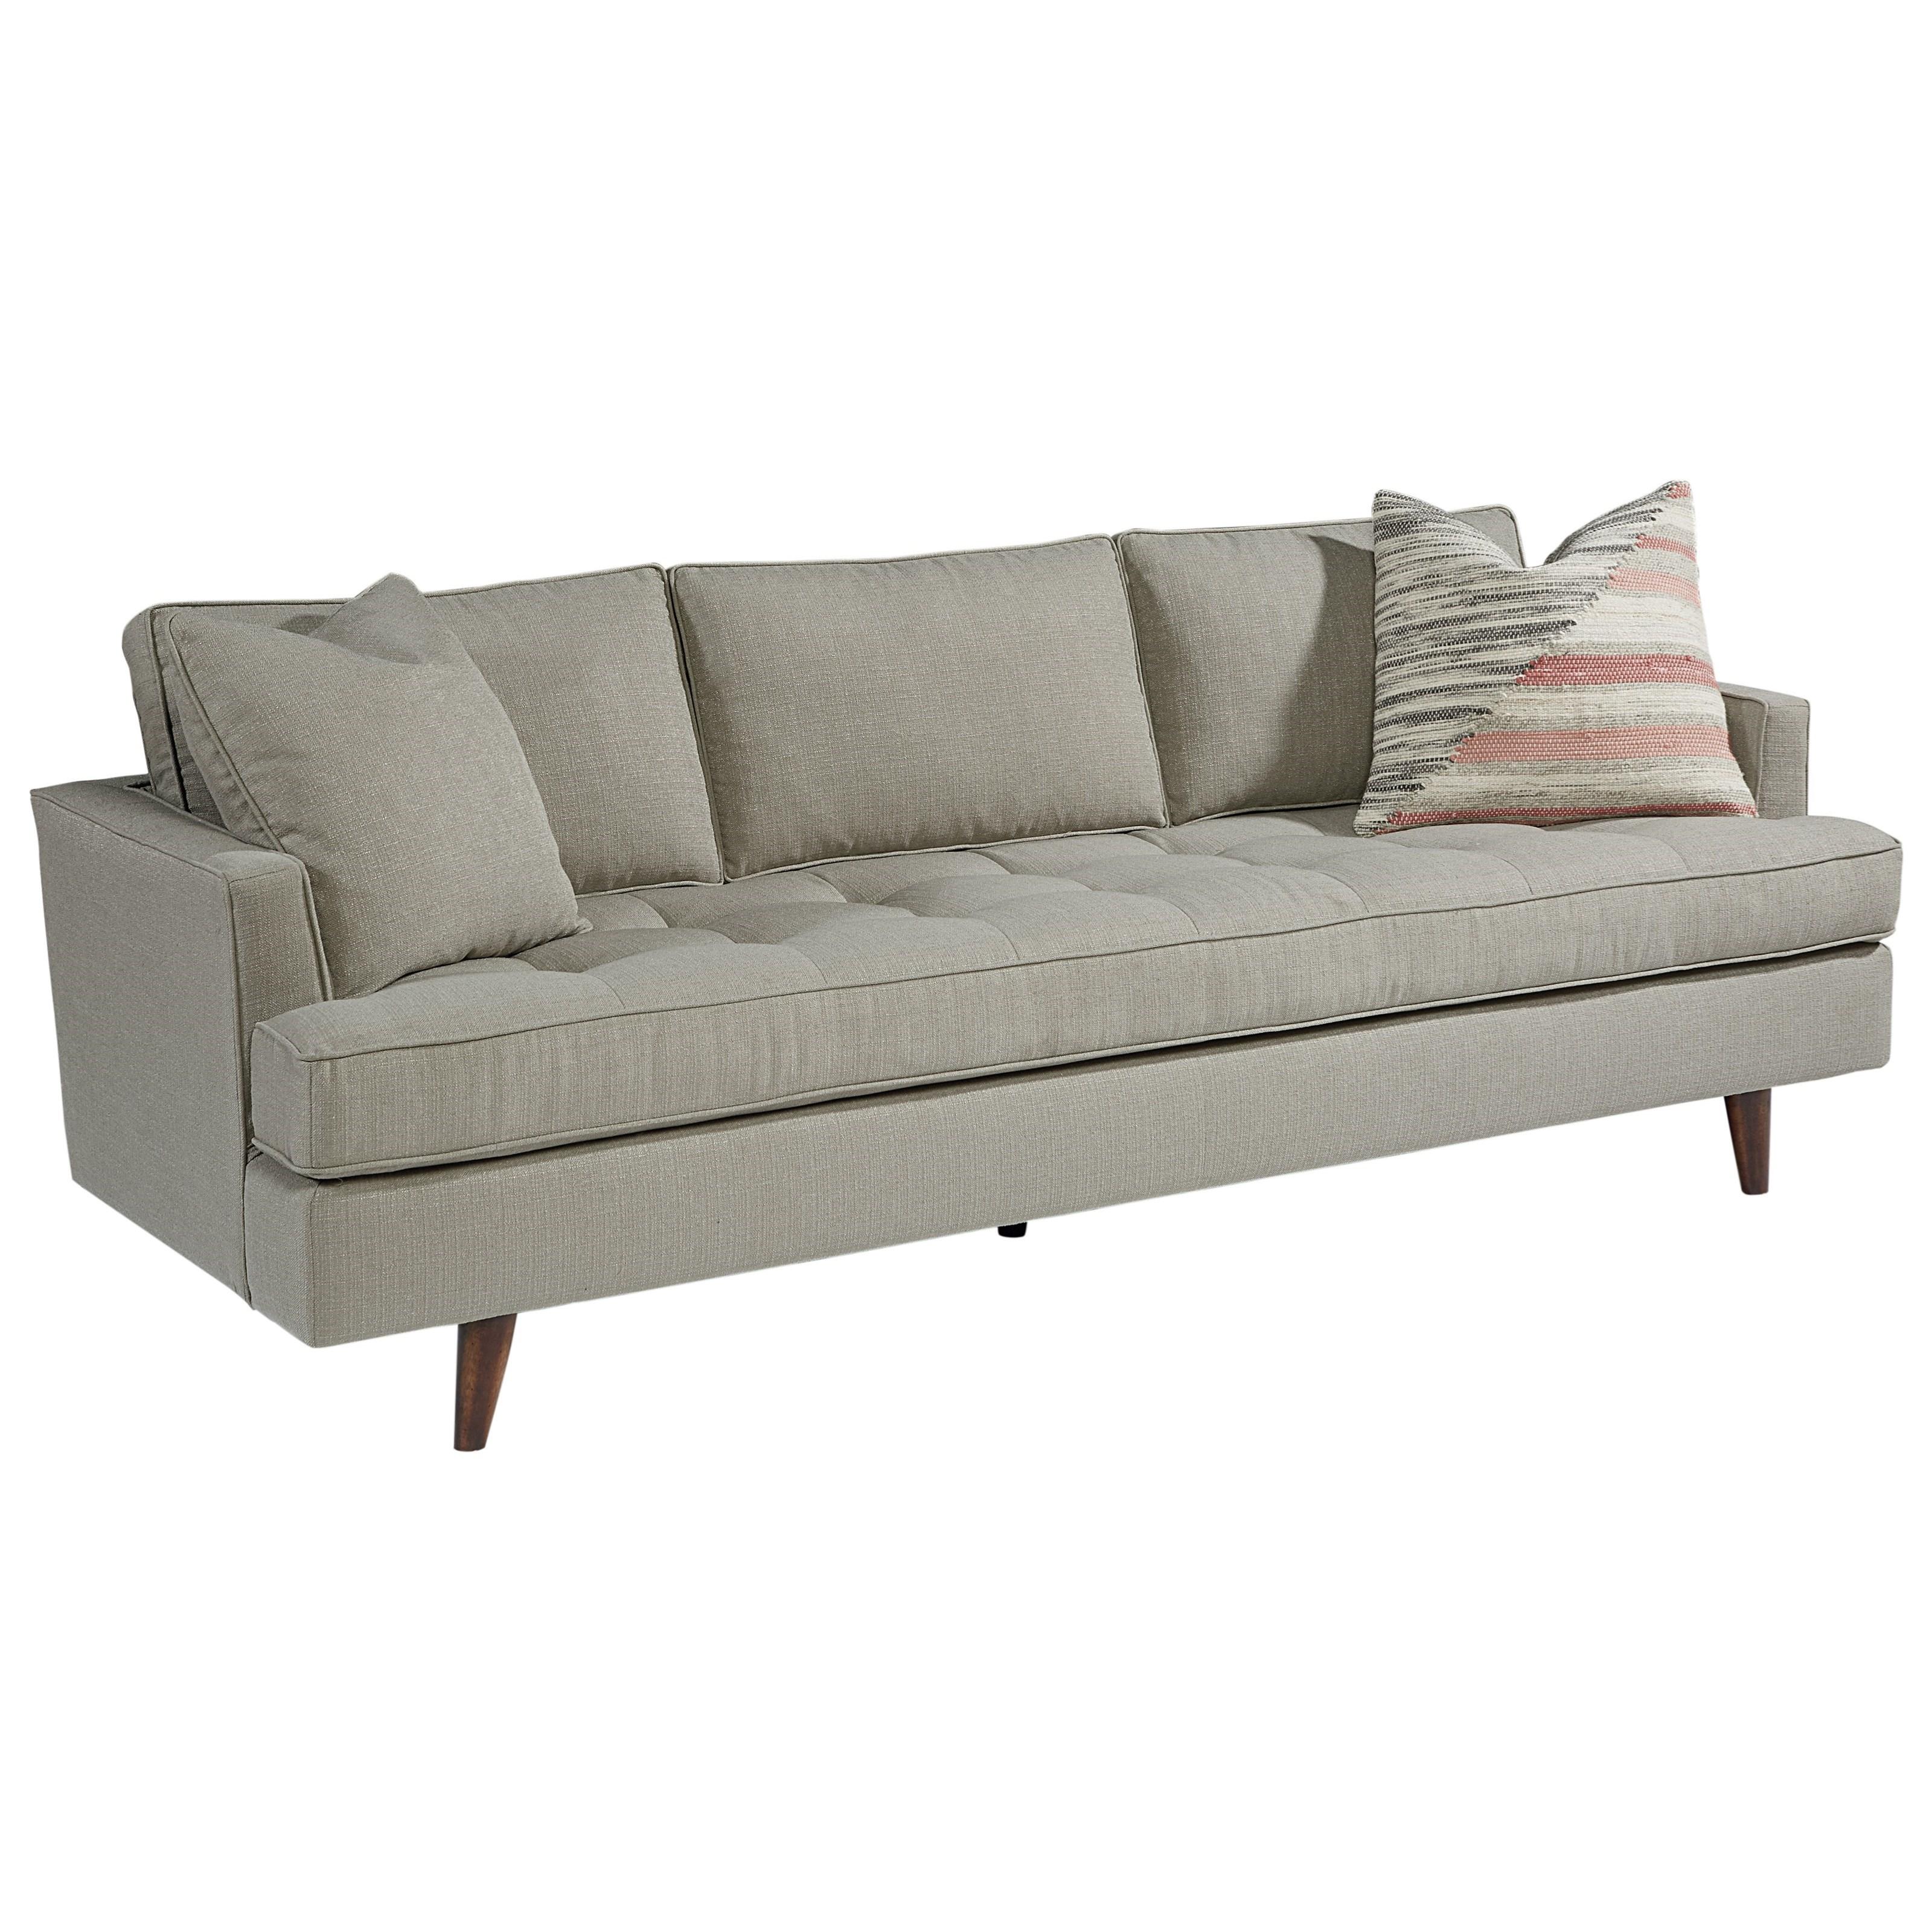 Magnolia Home By Joanna Gaines MCM Sofa